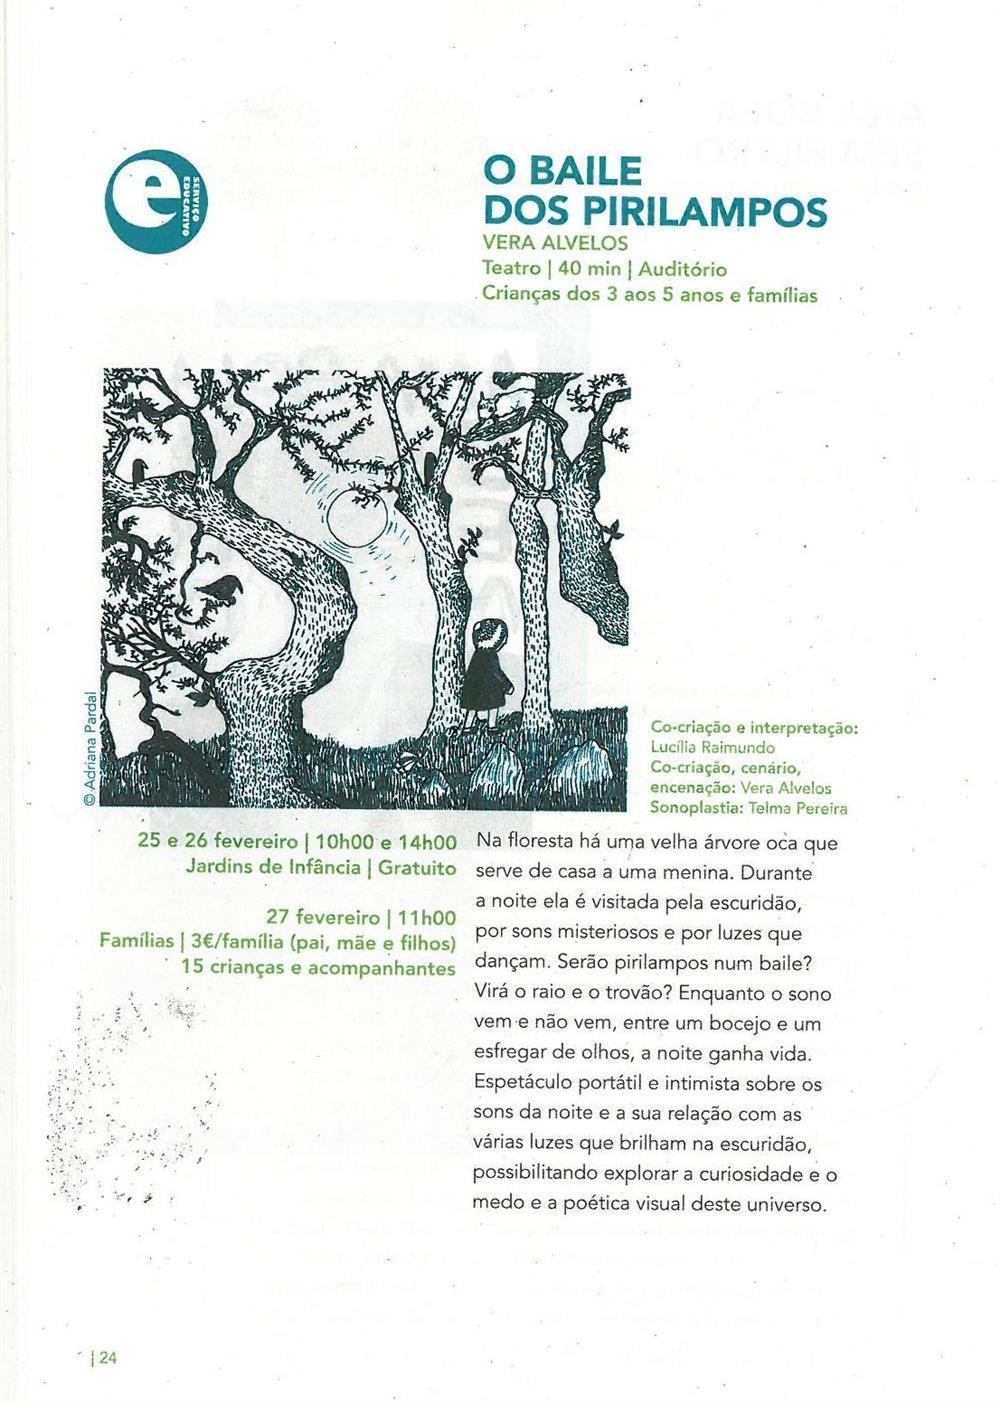 ACMSV-jan.,fev.,mar.'16-p.24-O baile dos pirilampos : Vera Alvelos.jpg